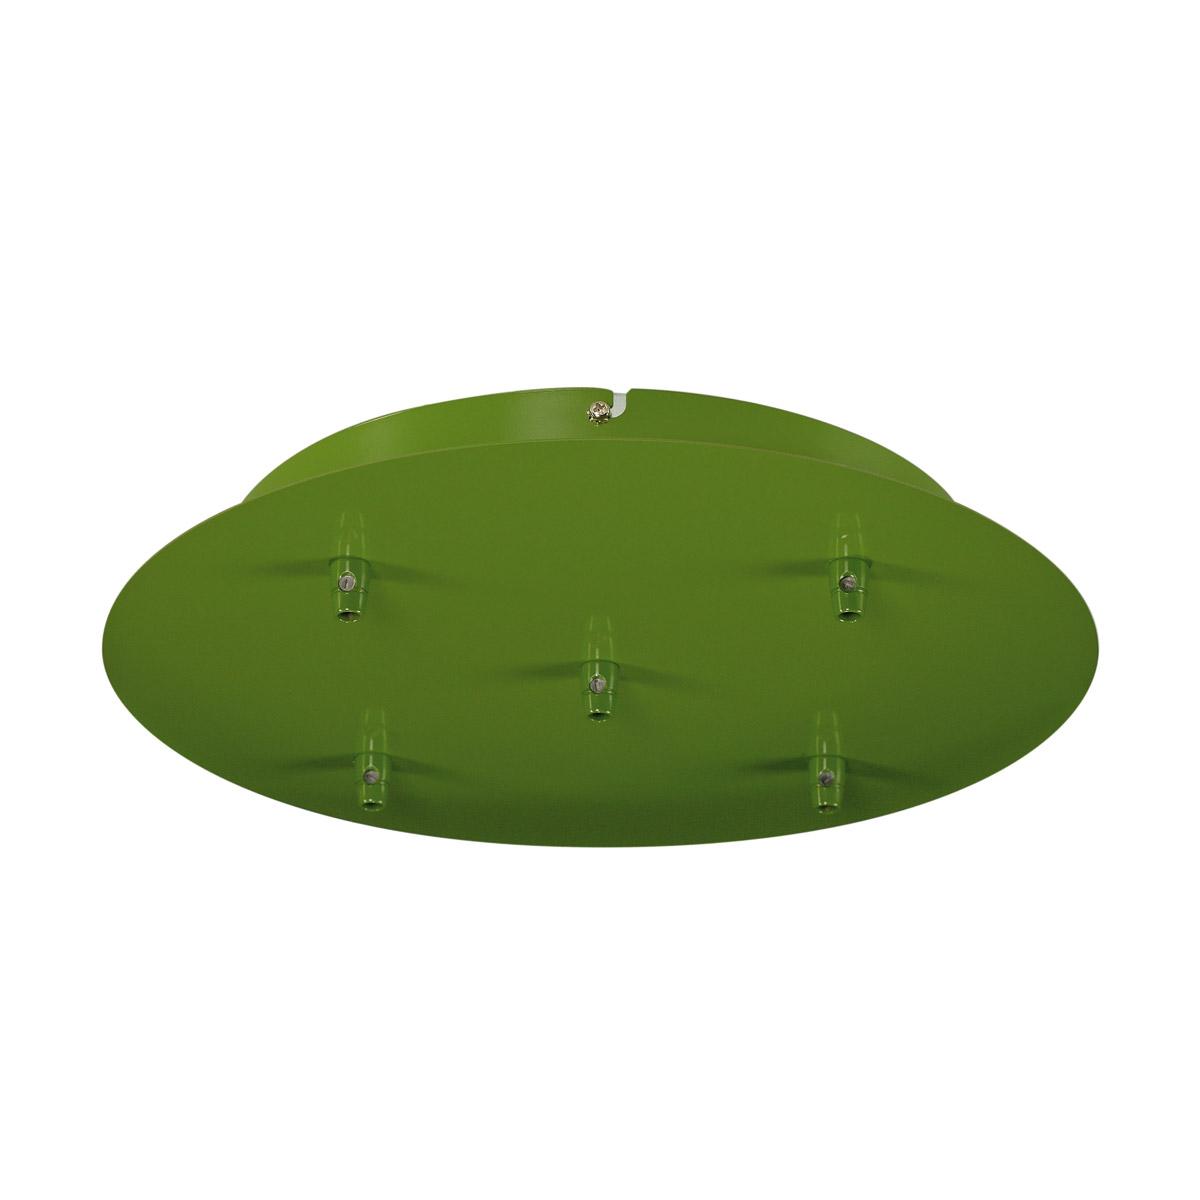 1 Stk Deckenrosette, 5 Ausgänge, farngrün, inkl. Zugentlastungen LI132628--